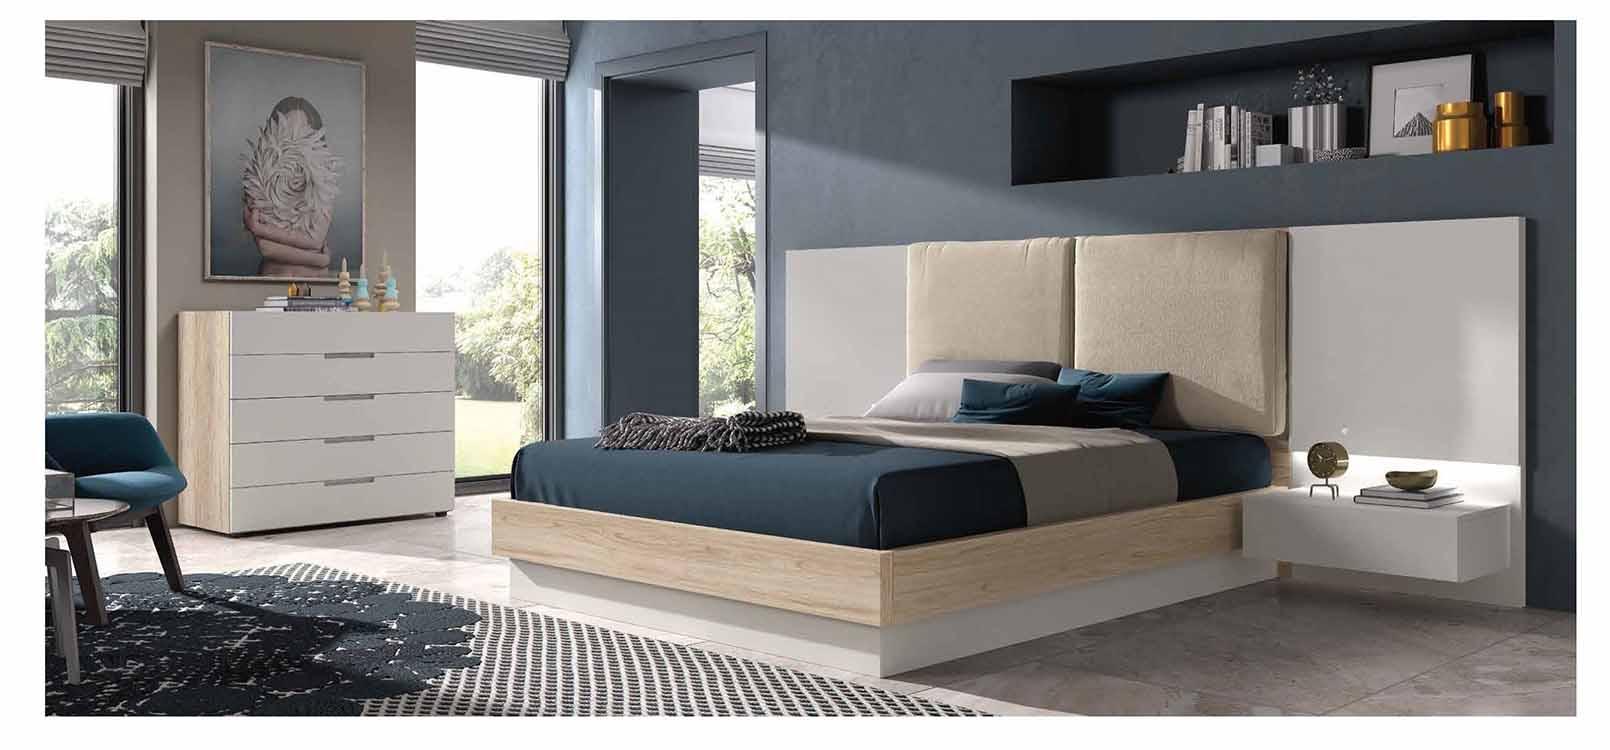 http://www.munozmuebles.net/nueva/catalogo/dormitorios-actuales.html -  Espectaculares muebles de eucalipto